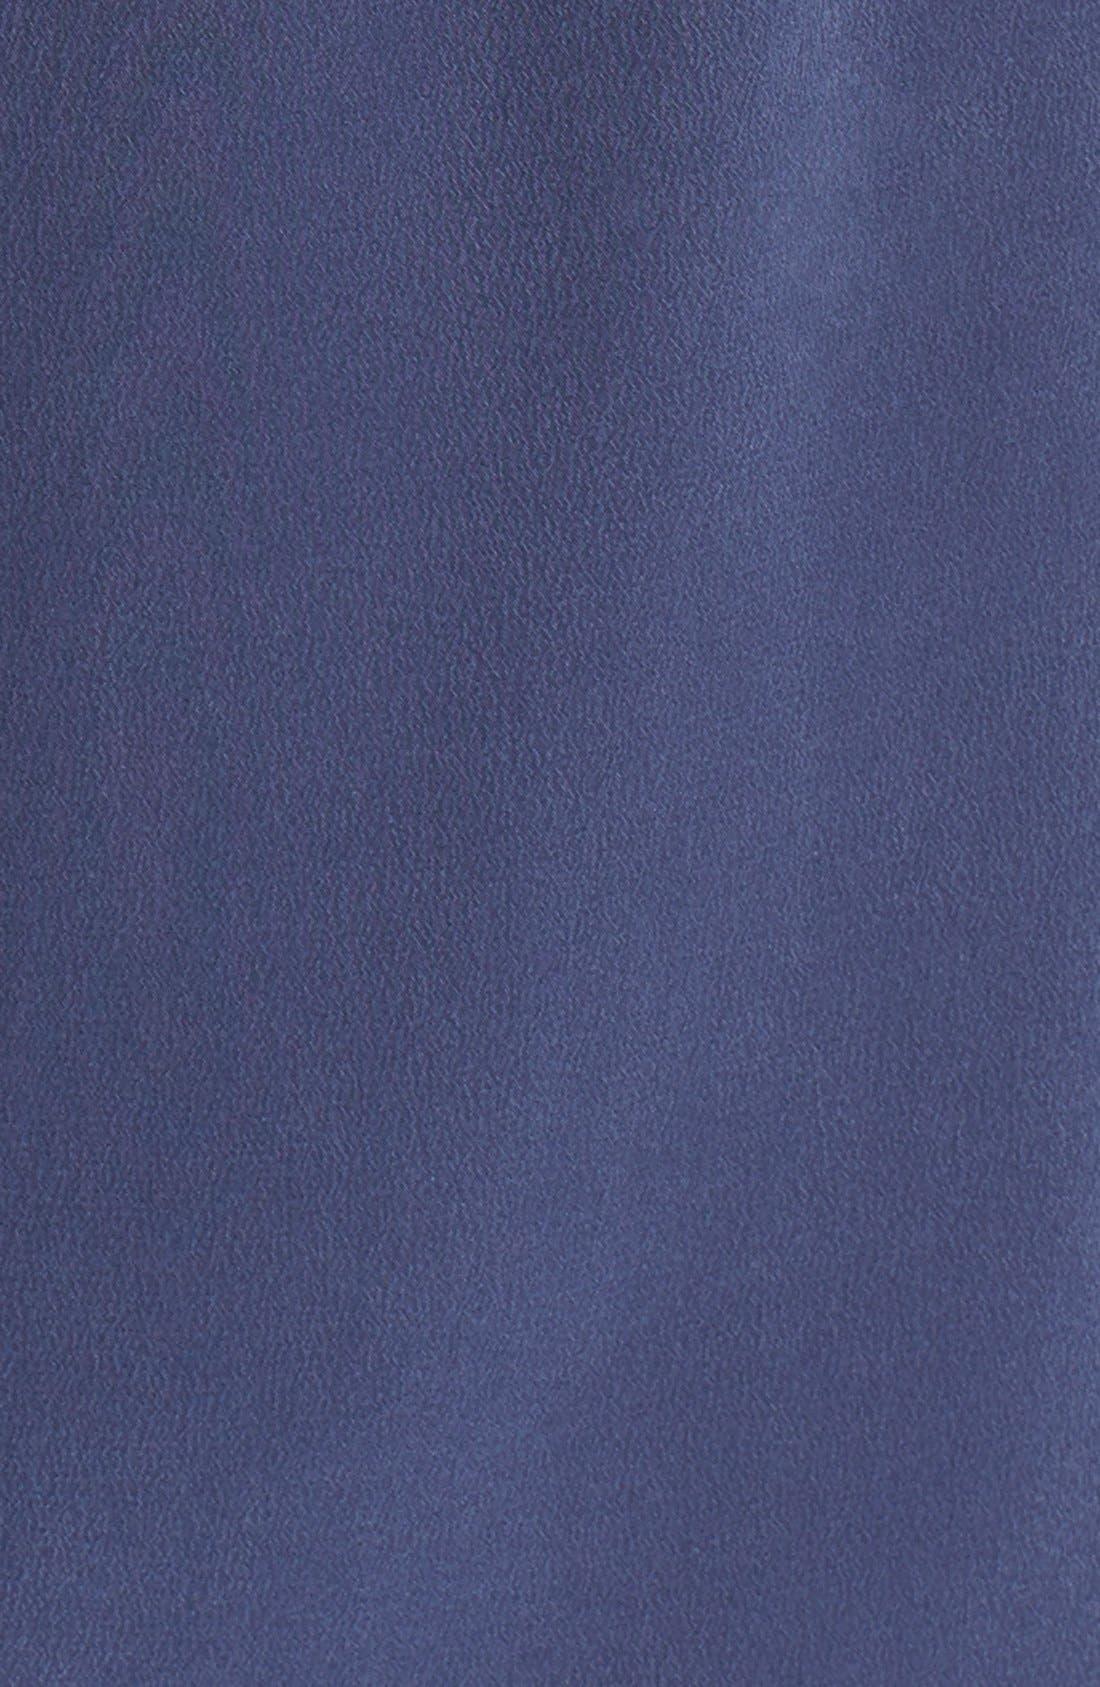 Alternate Image 3  - Equipment 'Signature' Silk Shirtdress